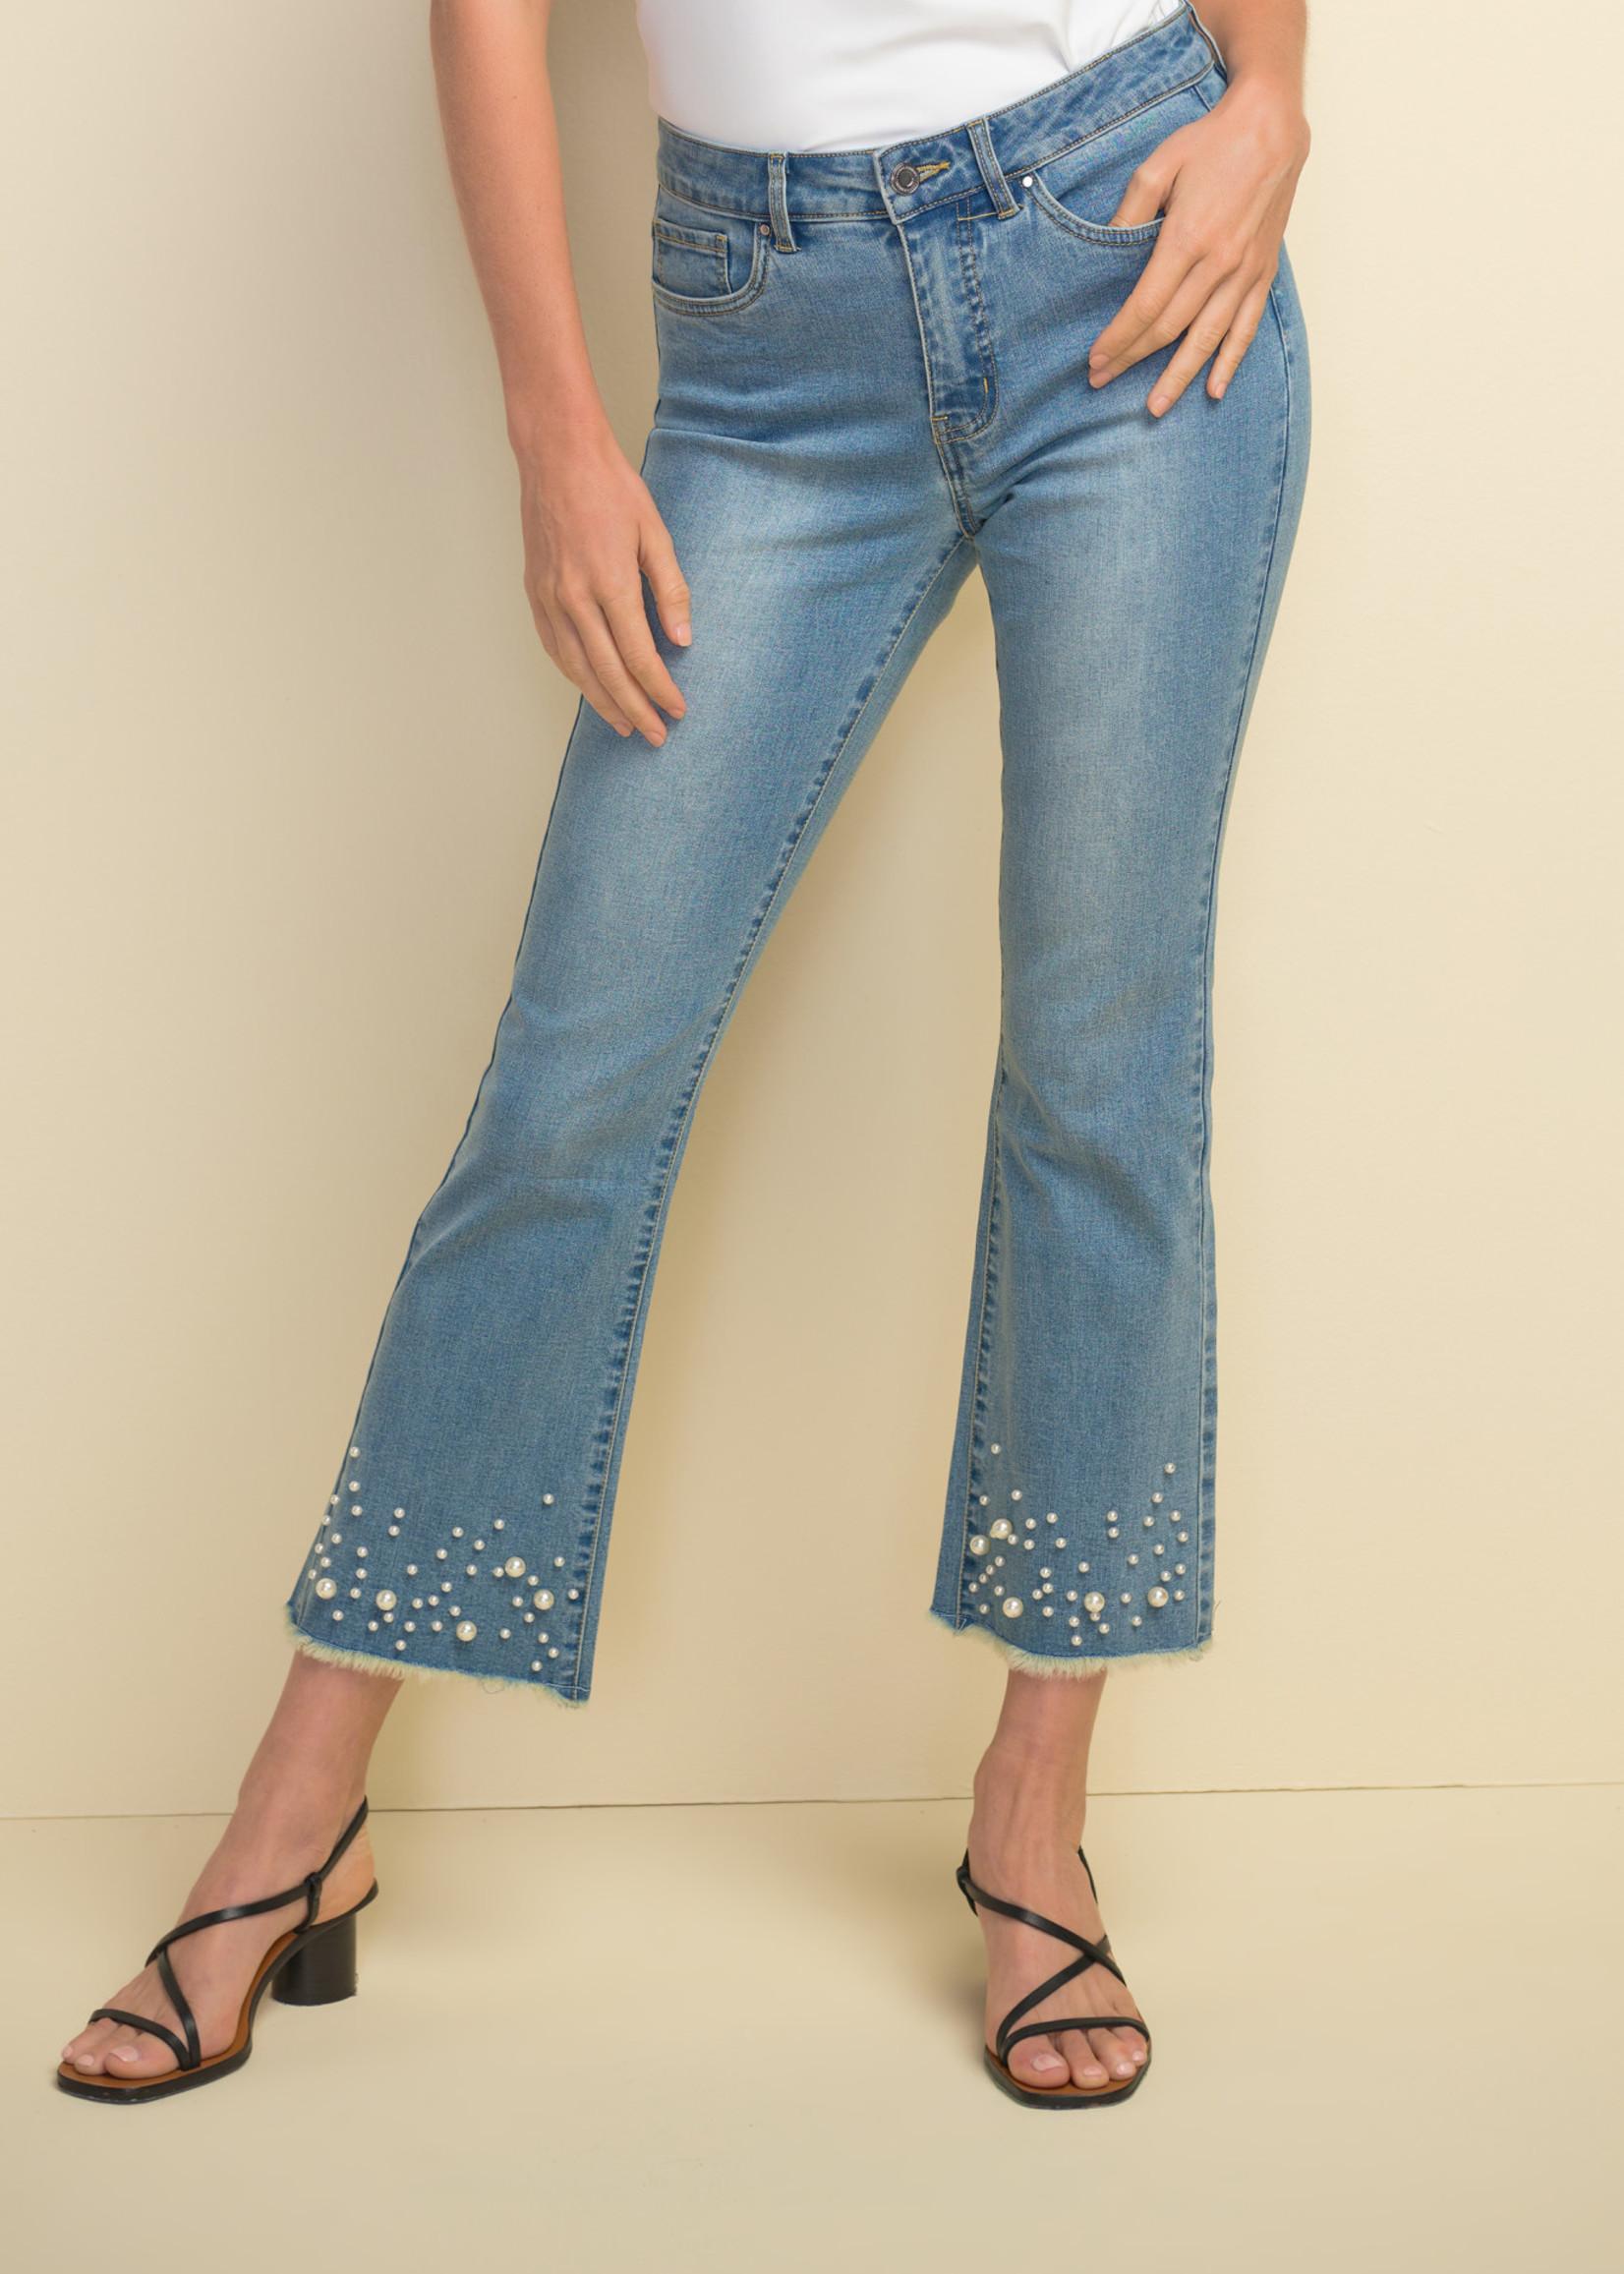 Joseph Ribkoff Joseph Ribkoff Pearl Detail Jeans